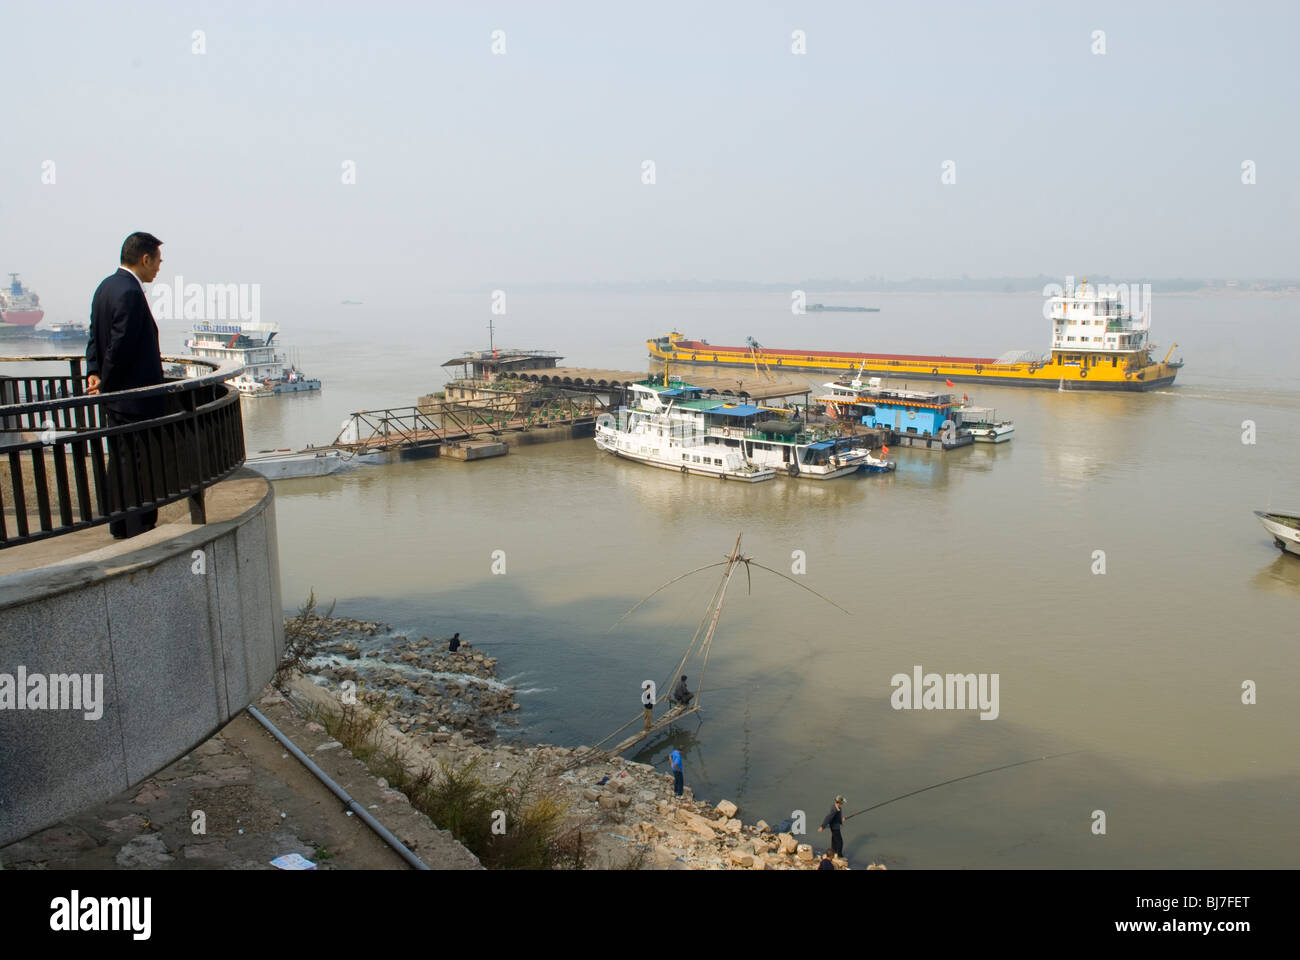 Navigation on the Yangzi river. Jiujiang,  Jiangxi province, China. - Stock Image